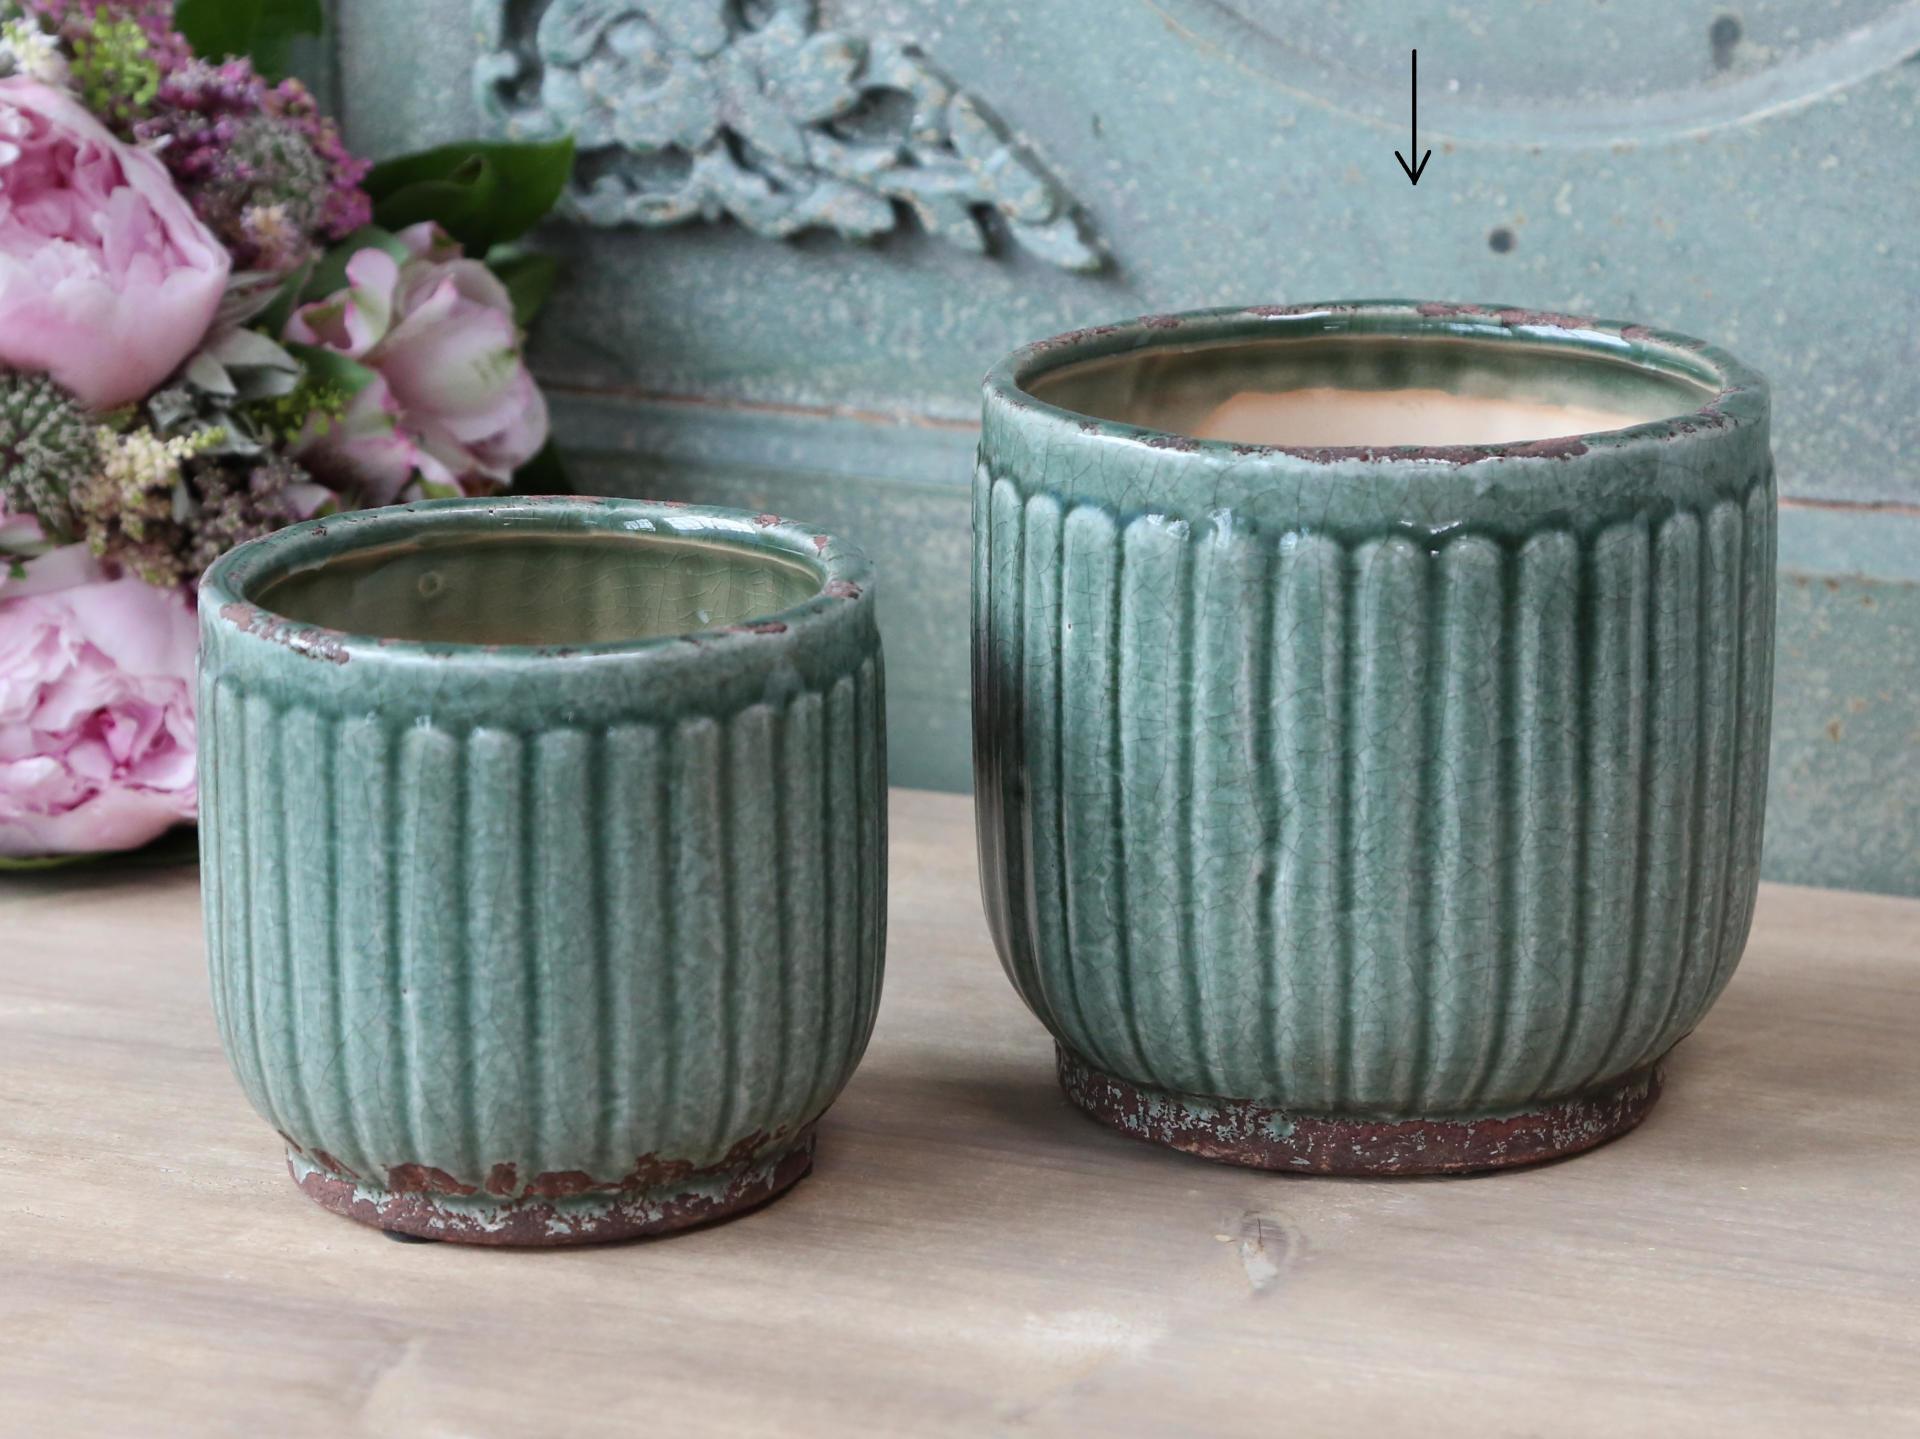 Chic Antique Obal na květiny Moss Green, zelená barva, keramika